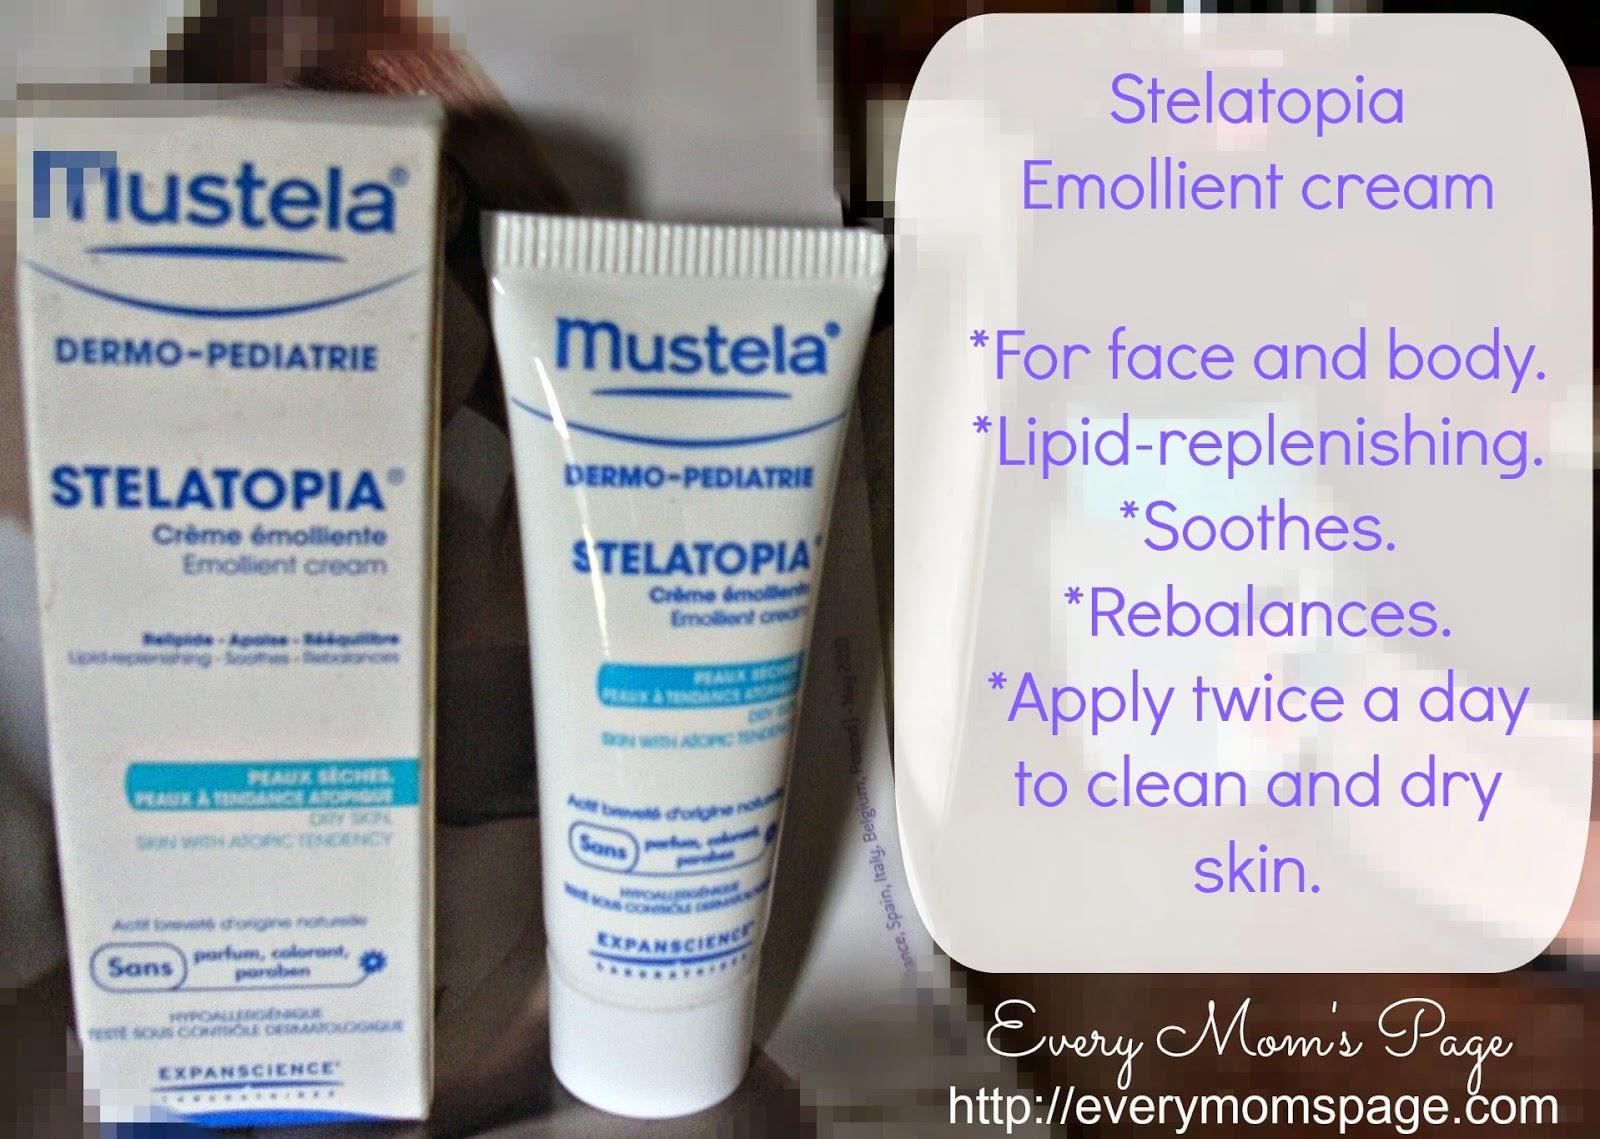 Stelatopia Emollient Cream by mustela #3